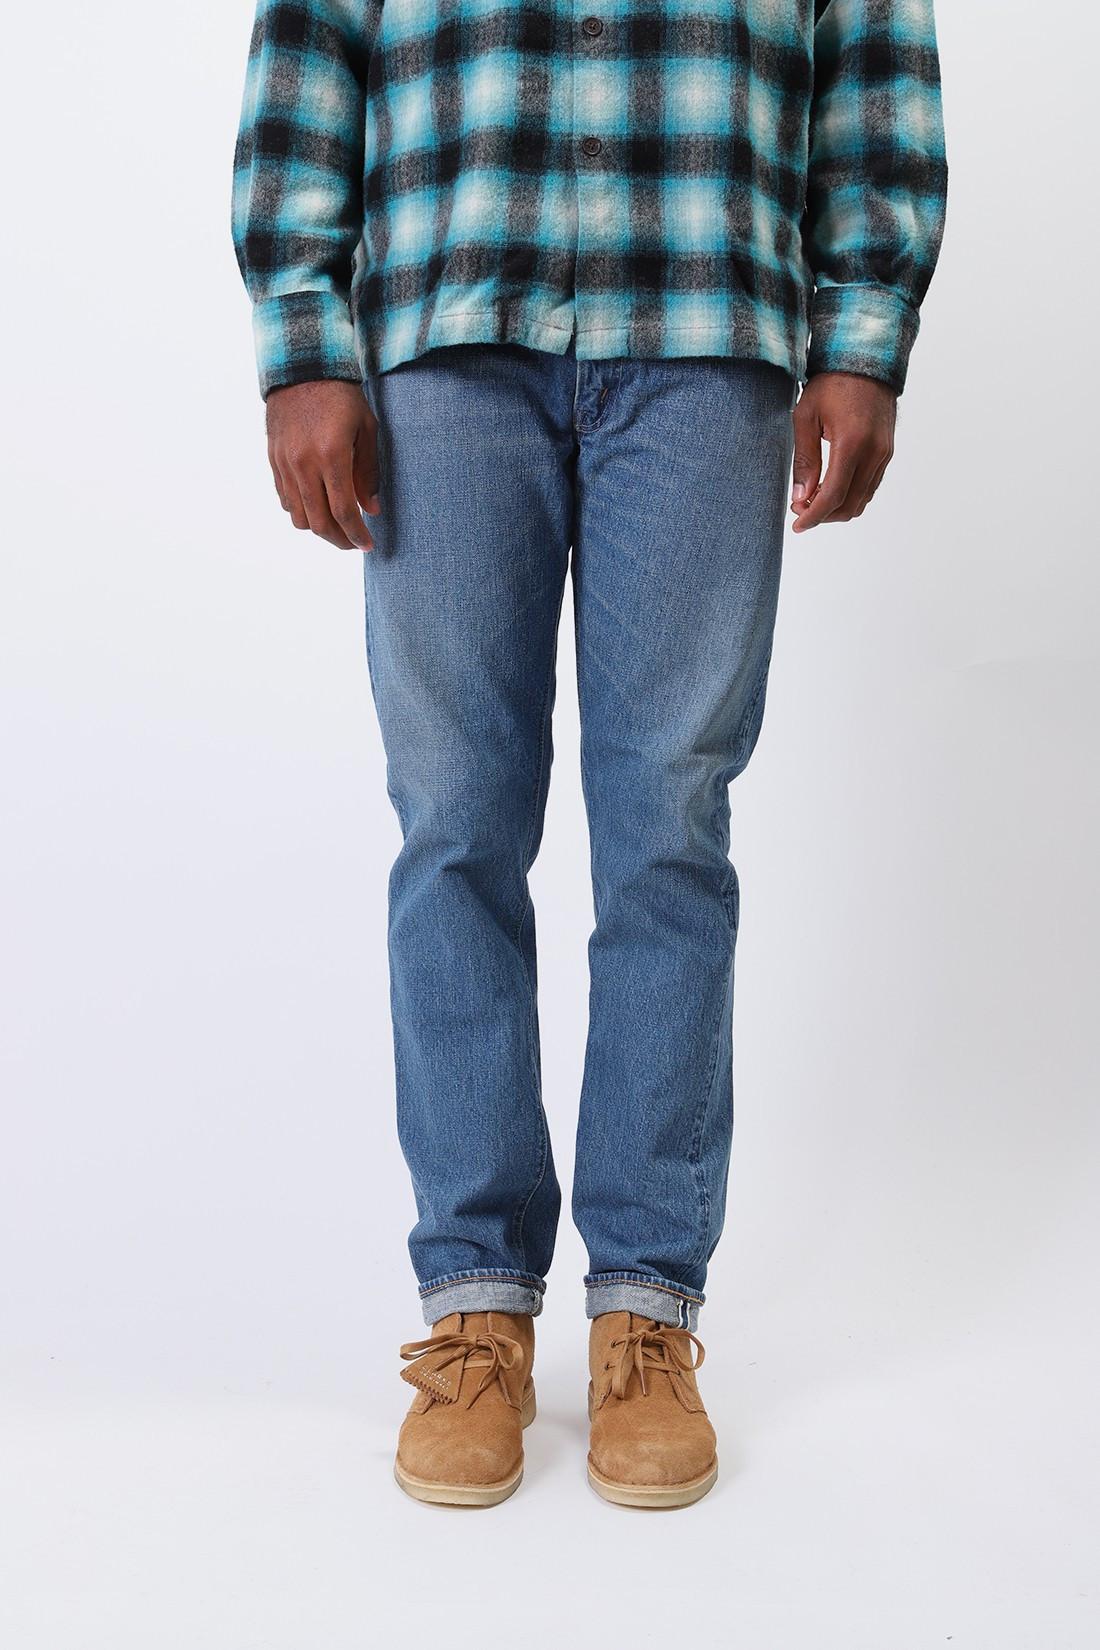 ORSLOW / 2 year wash 107 slim fit jean Indigo